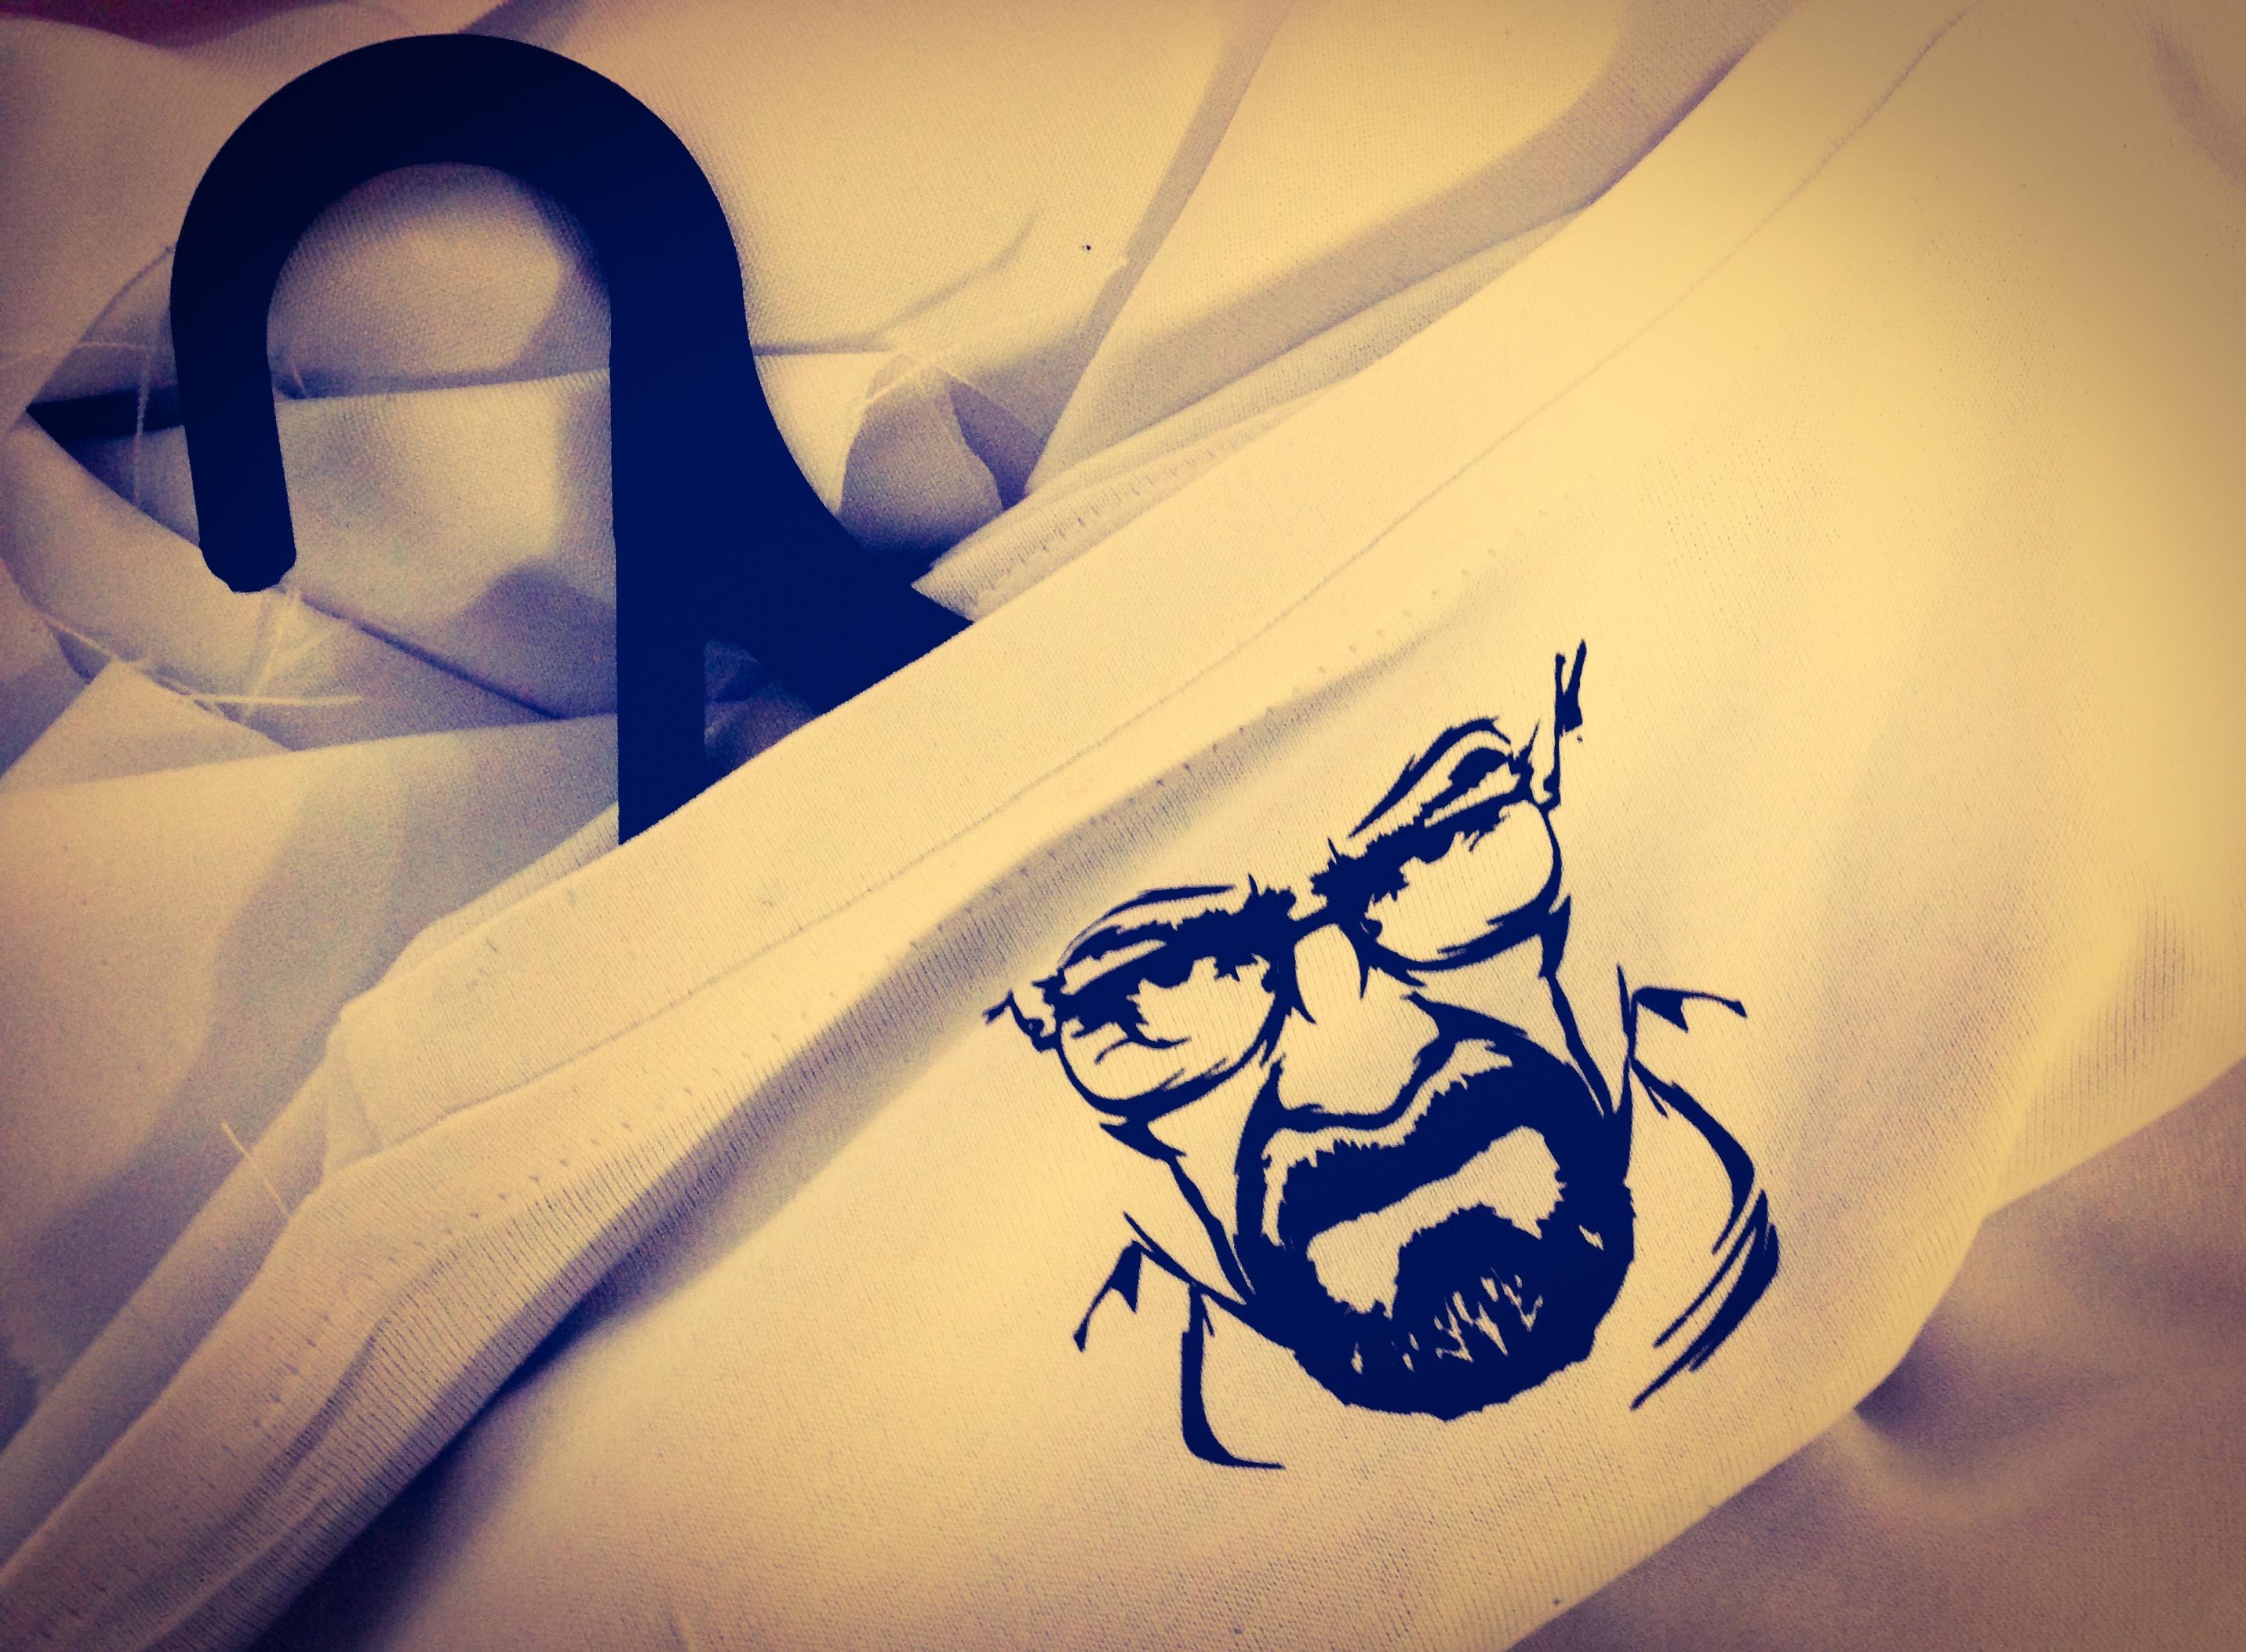 Печать на футболках сублимация фото